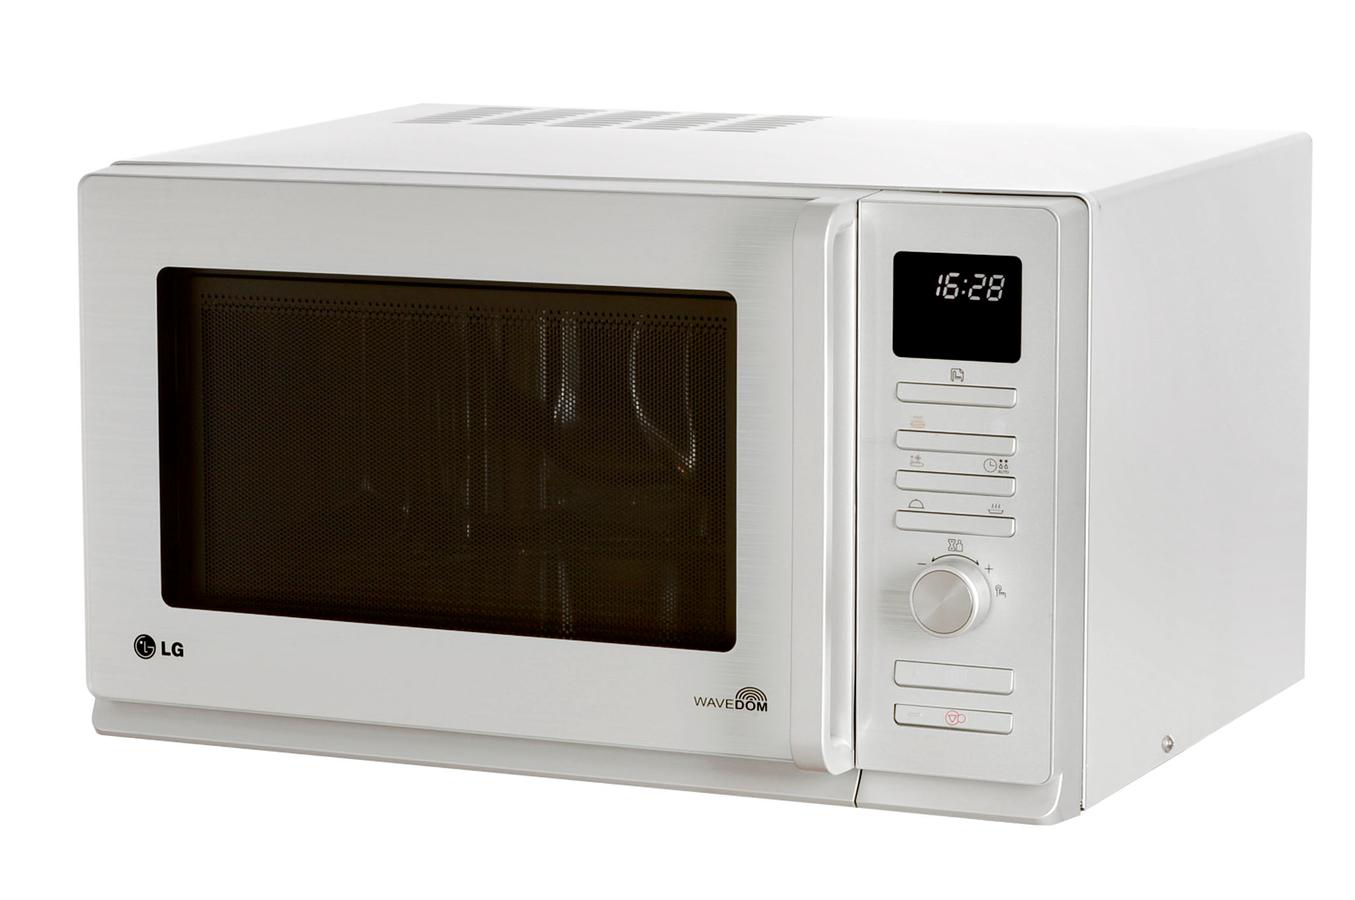 micro ondes combin lg mc 8280 silver 3211215 darty. Black Bedroom Furniture Sets. Home Design Ideas